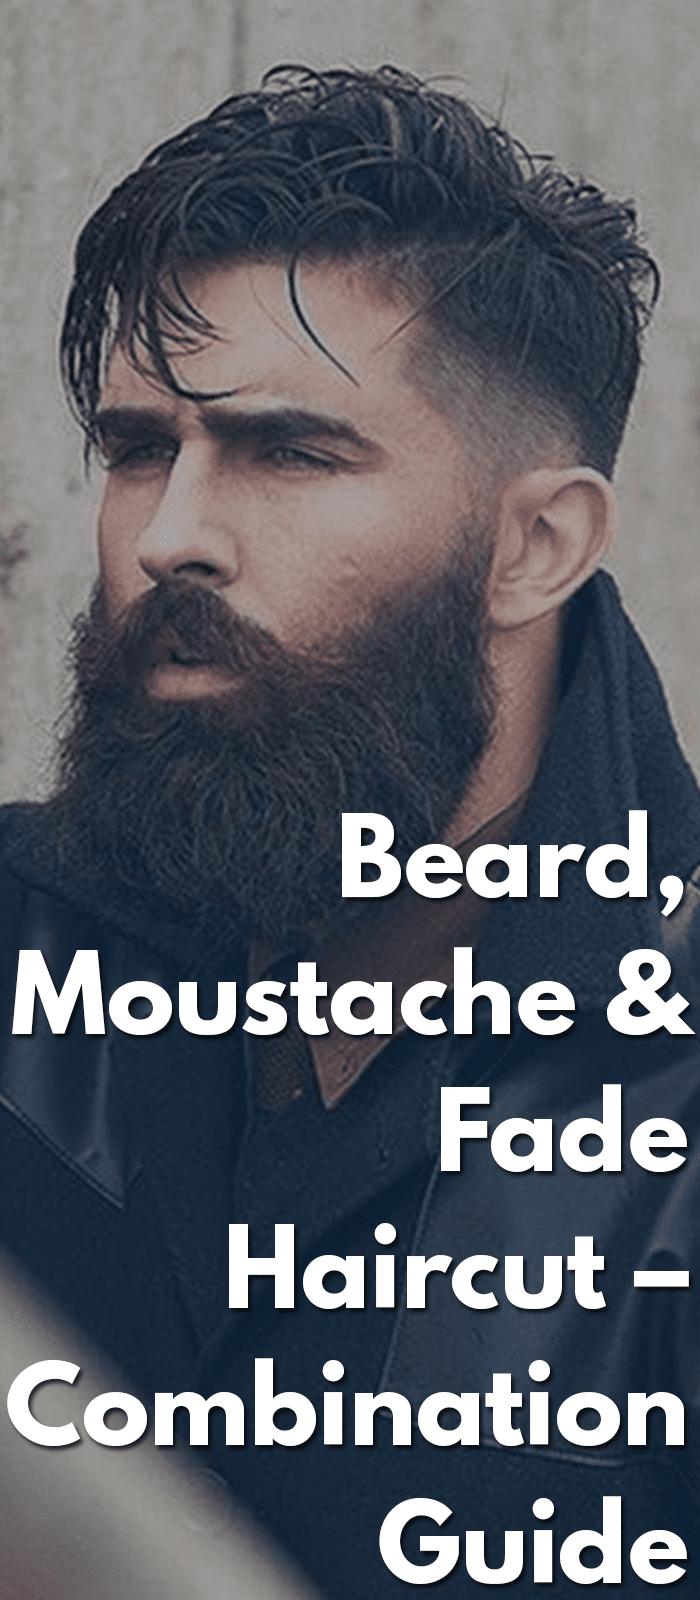 Beard,-Moustache-&-Fade-Haircut-–-Combination-Guide.